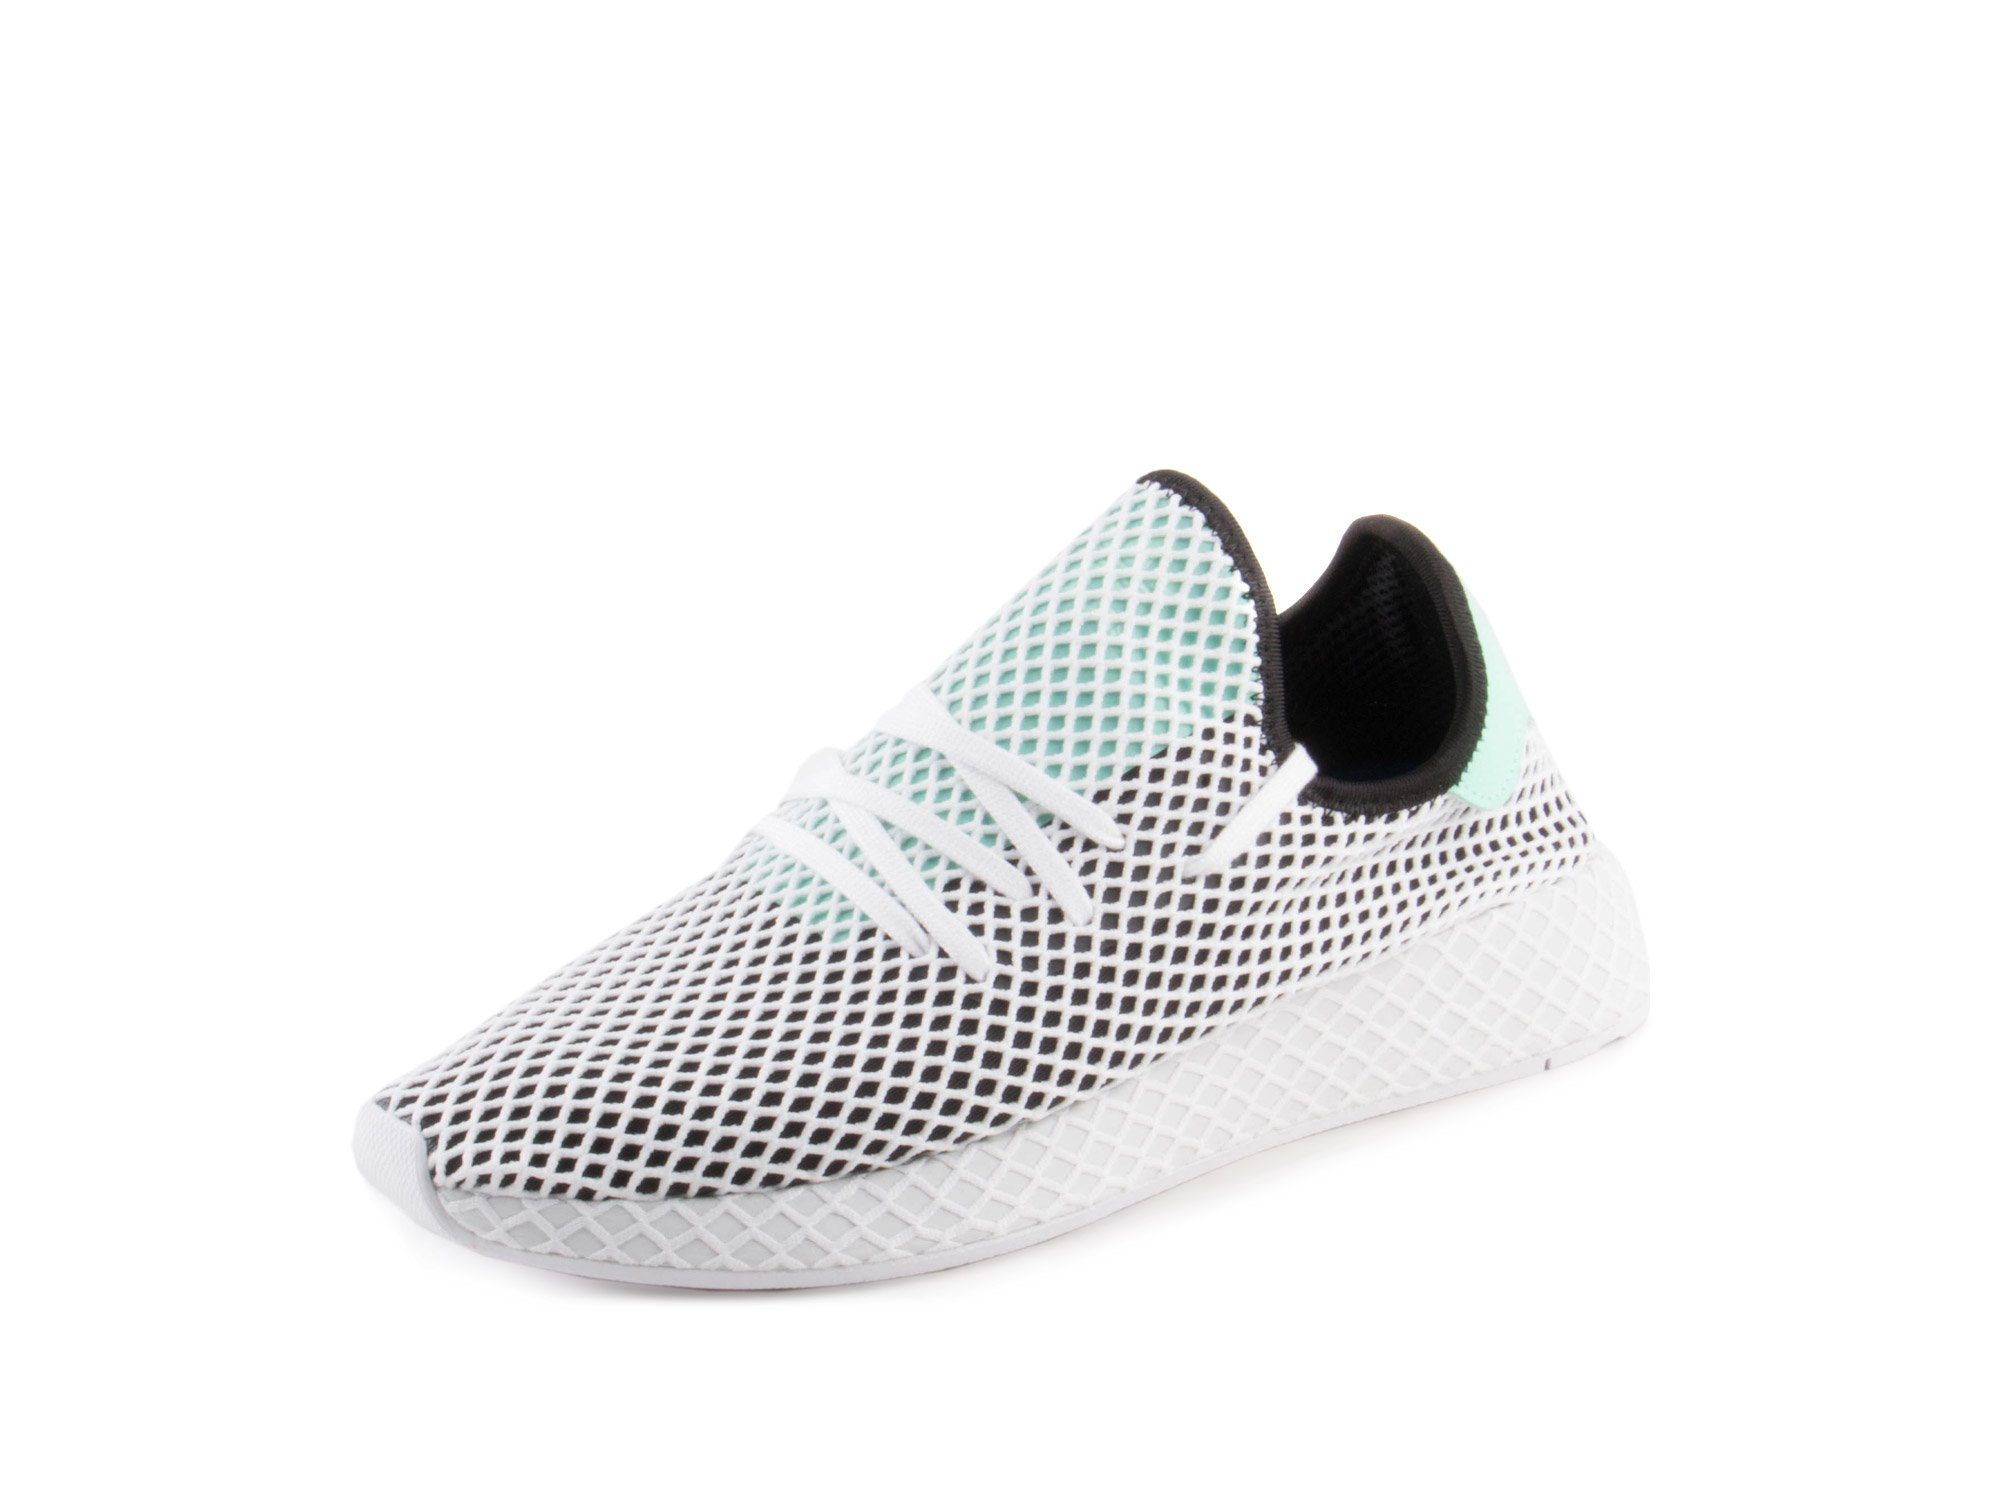 9970b0c95b8fd Galleon - Adidas Mens Originals Deerupt Runner Core Black Easy Green White  Mesh Size 11